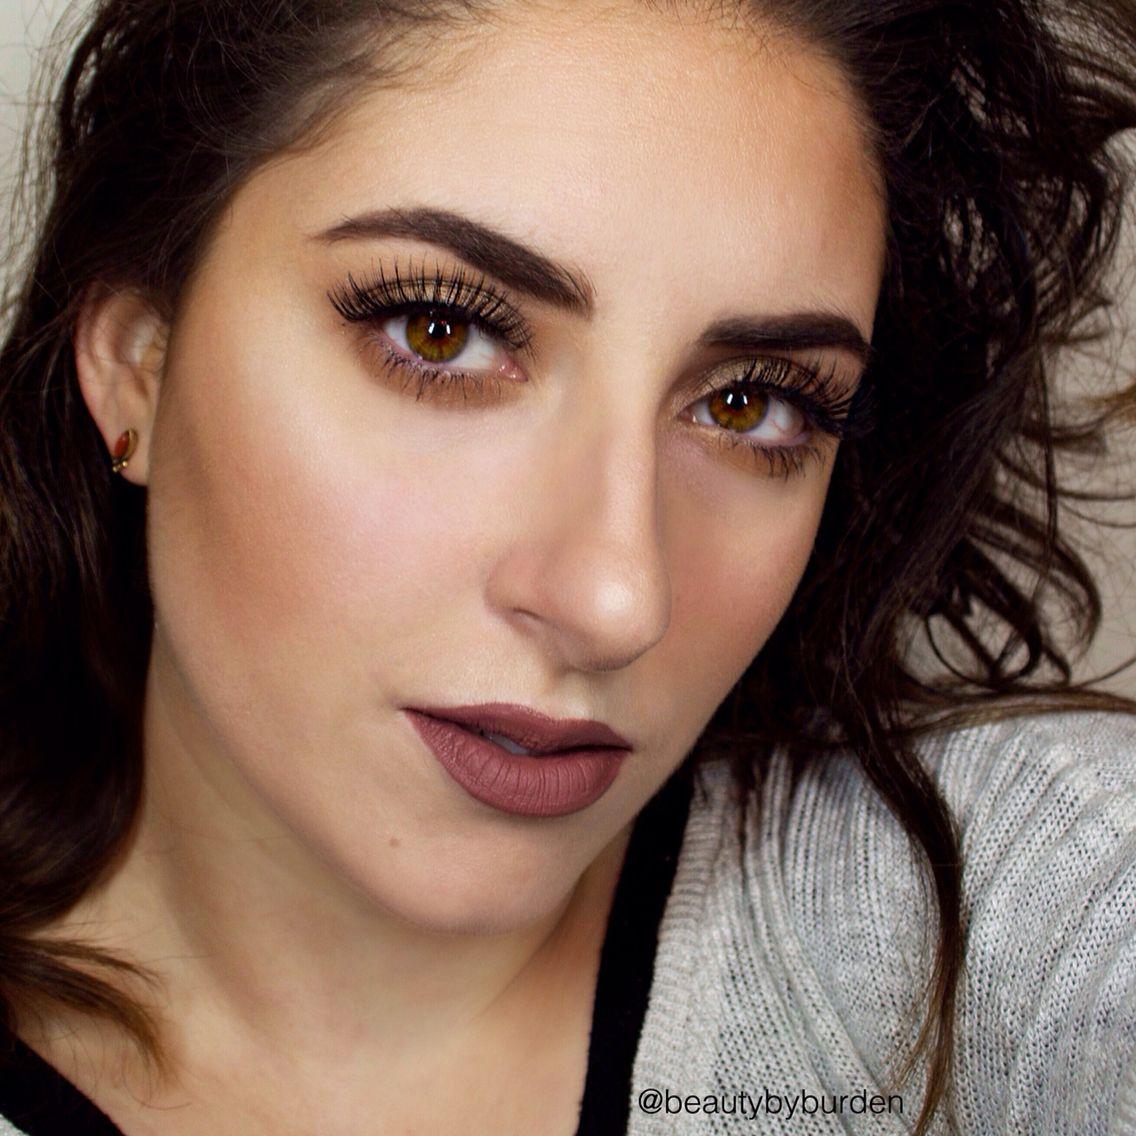 Beautybyburden Bronzer Hourglass Brows Senna Cosmetics Nars